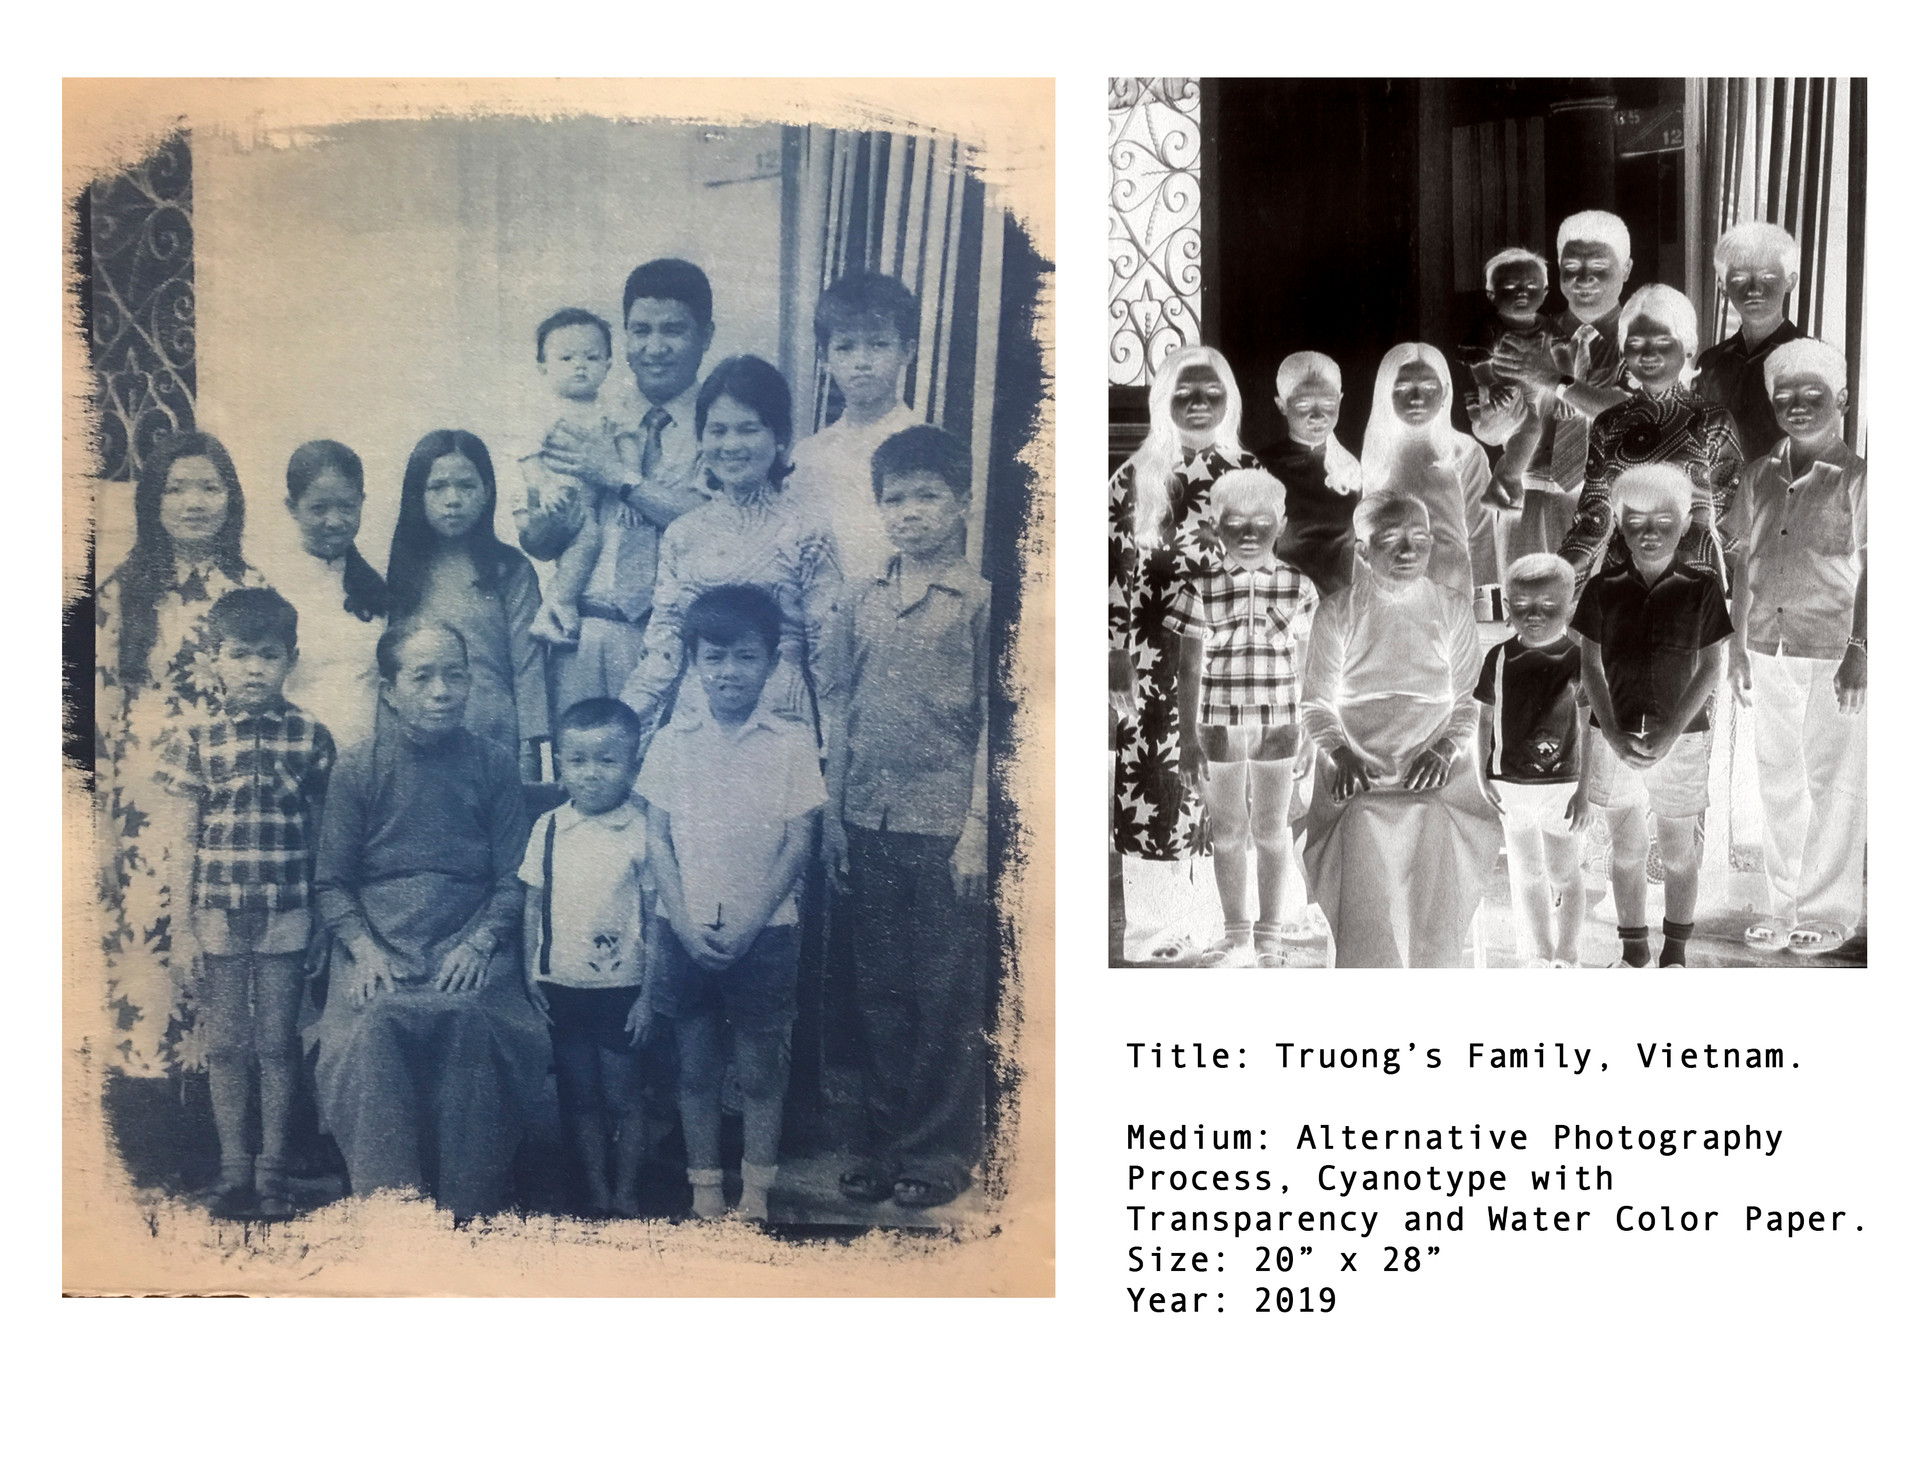 Truong's Family